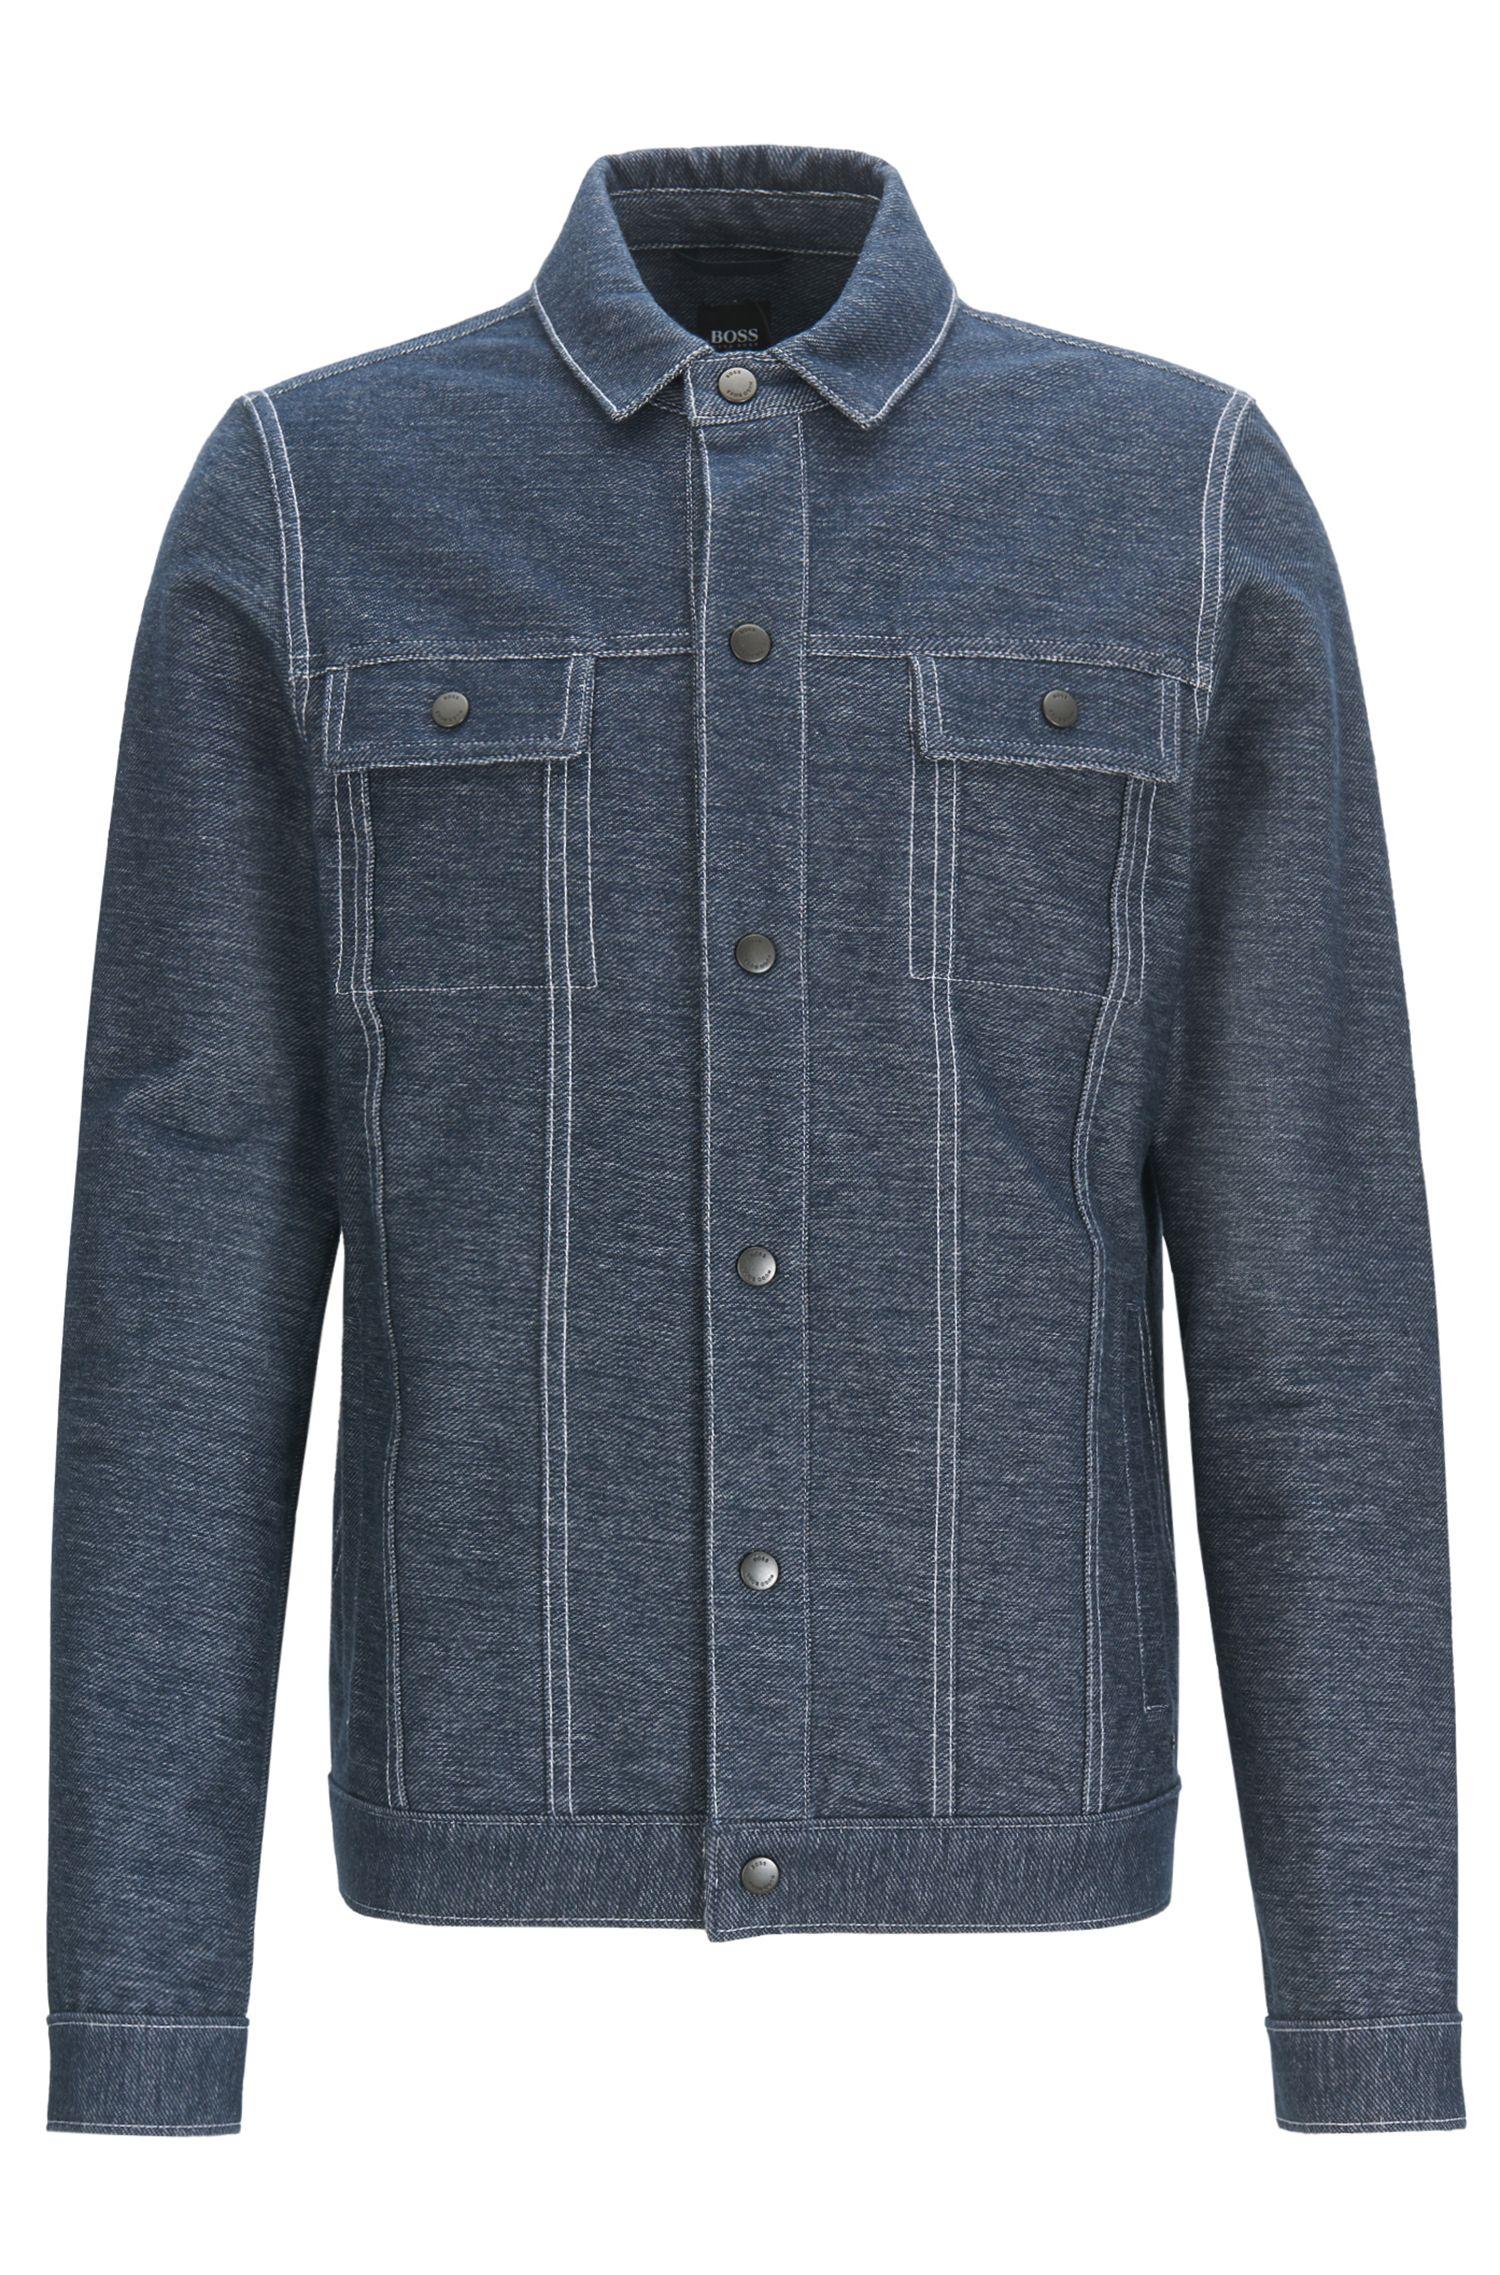 Stretch Jersey Denim Jacket | Sigmon